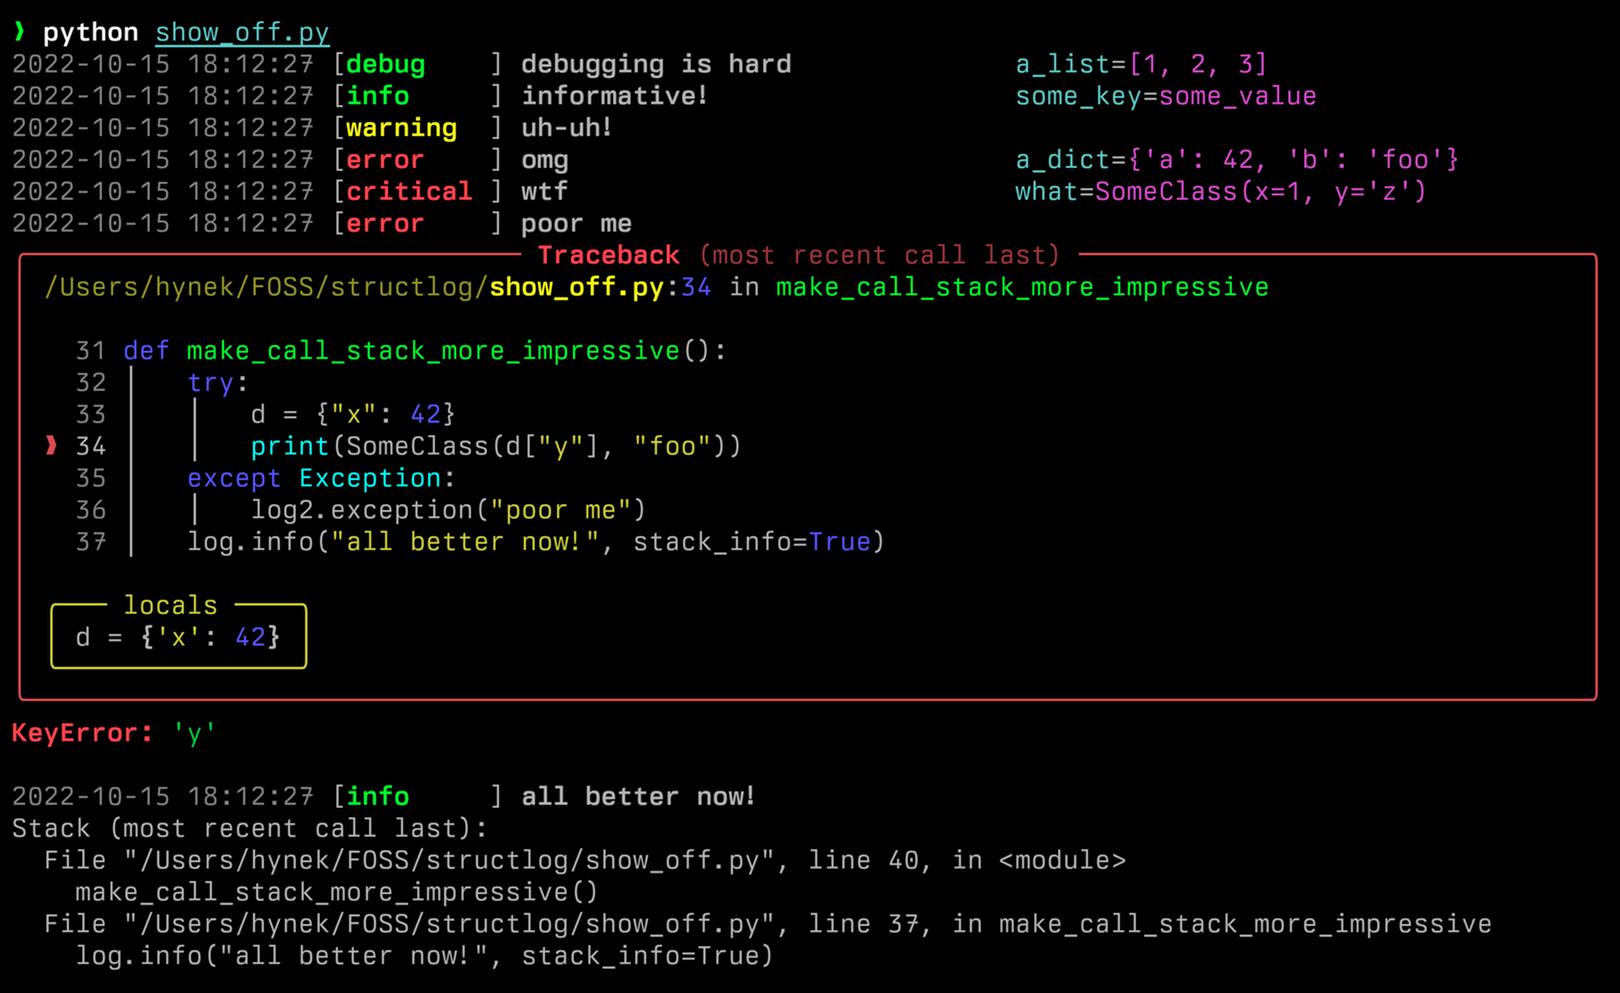 https://github.com/hynek/structlog/blob/main/docs/_static/console_renderer.png?raw=true